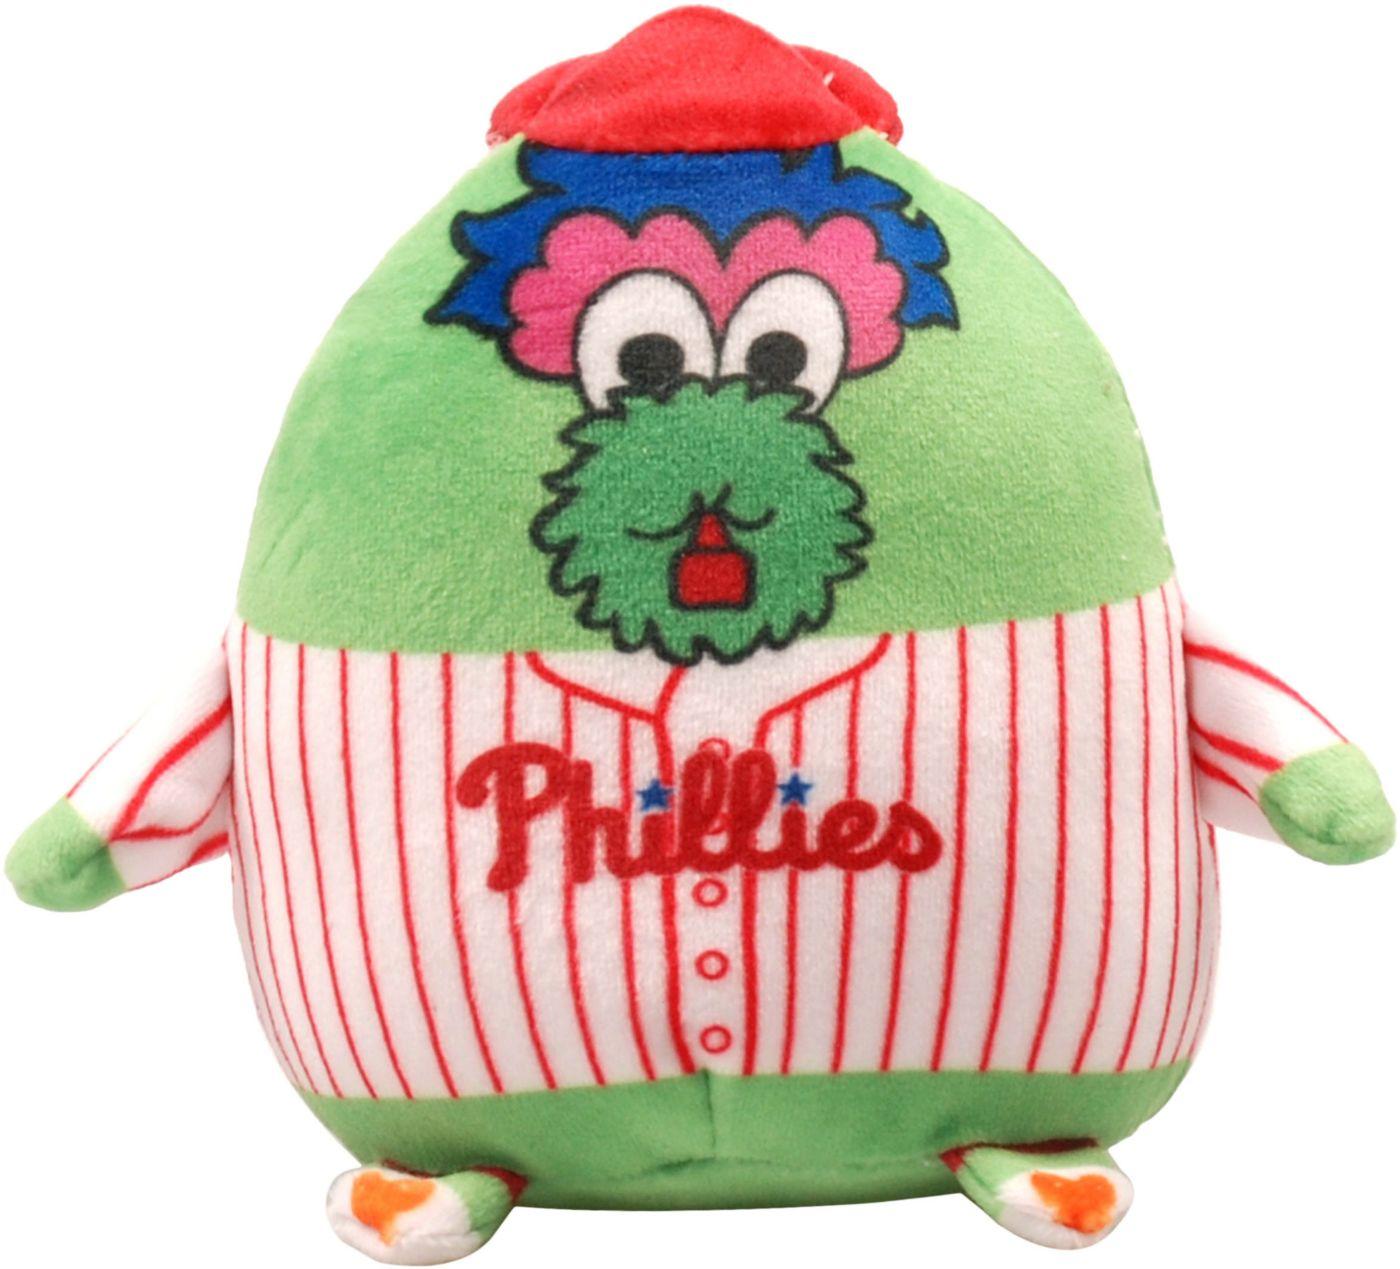 FOCO Philadelphia Phillies Mascot  Smusher Plush